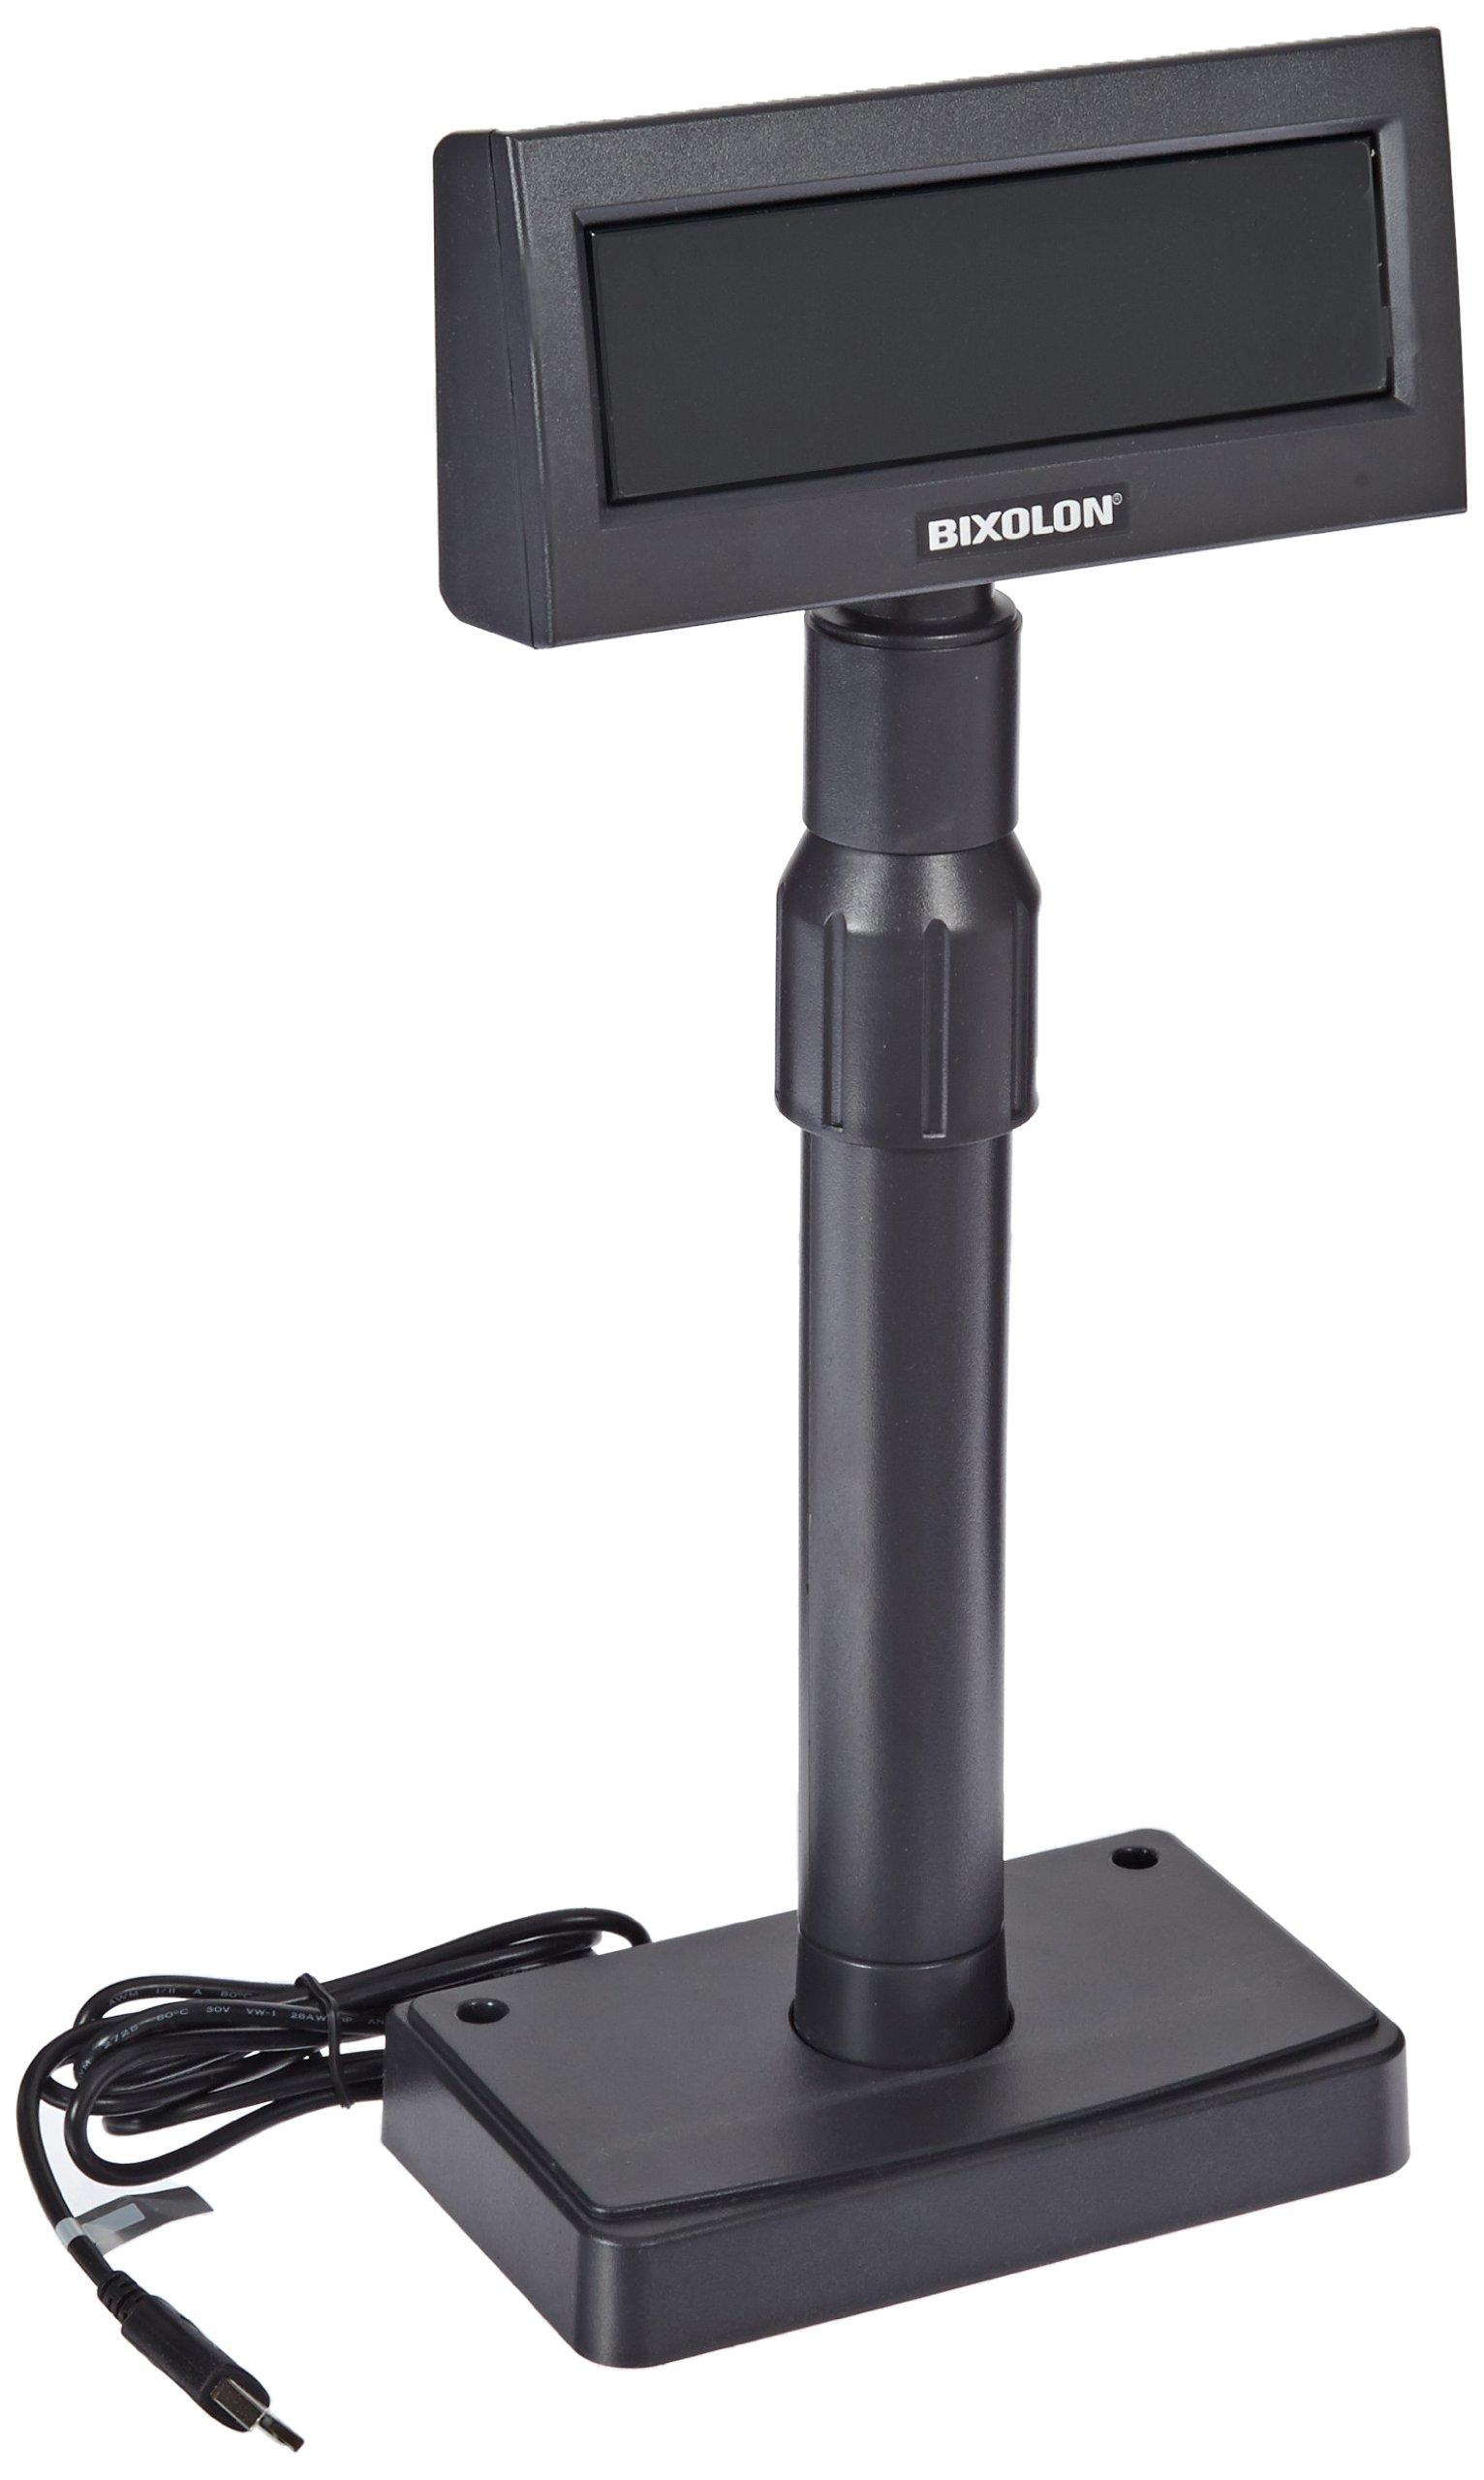 Bixolon BCD-1100 Vacuum Fluorescent Customer Pole Display with USB Interface, 5-24 VDC, Black